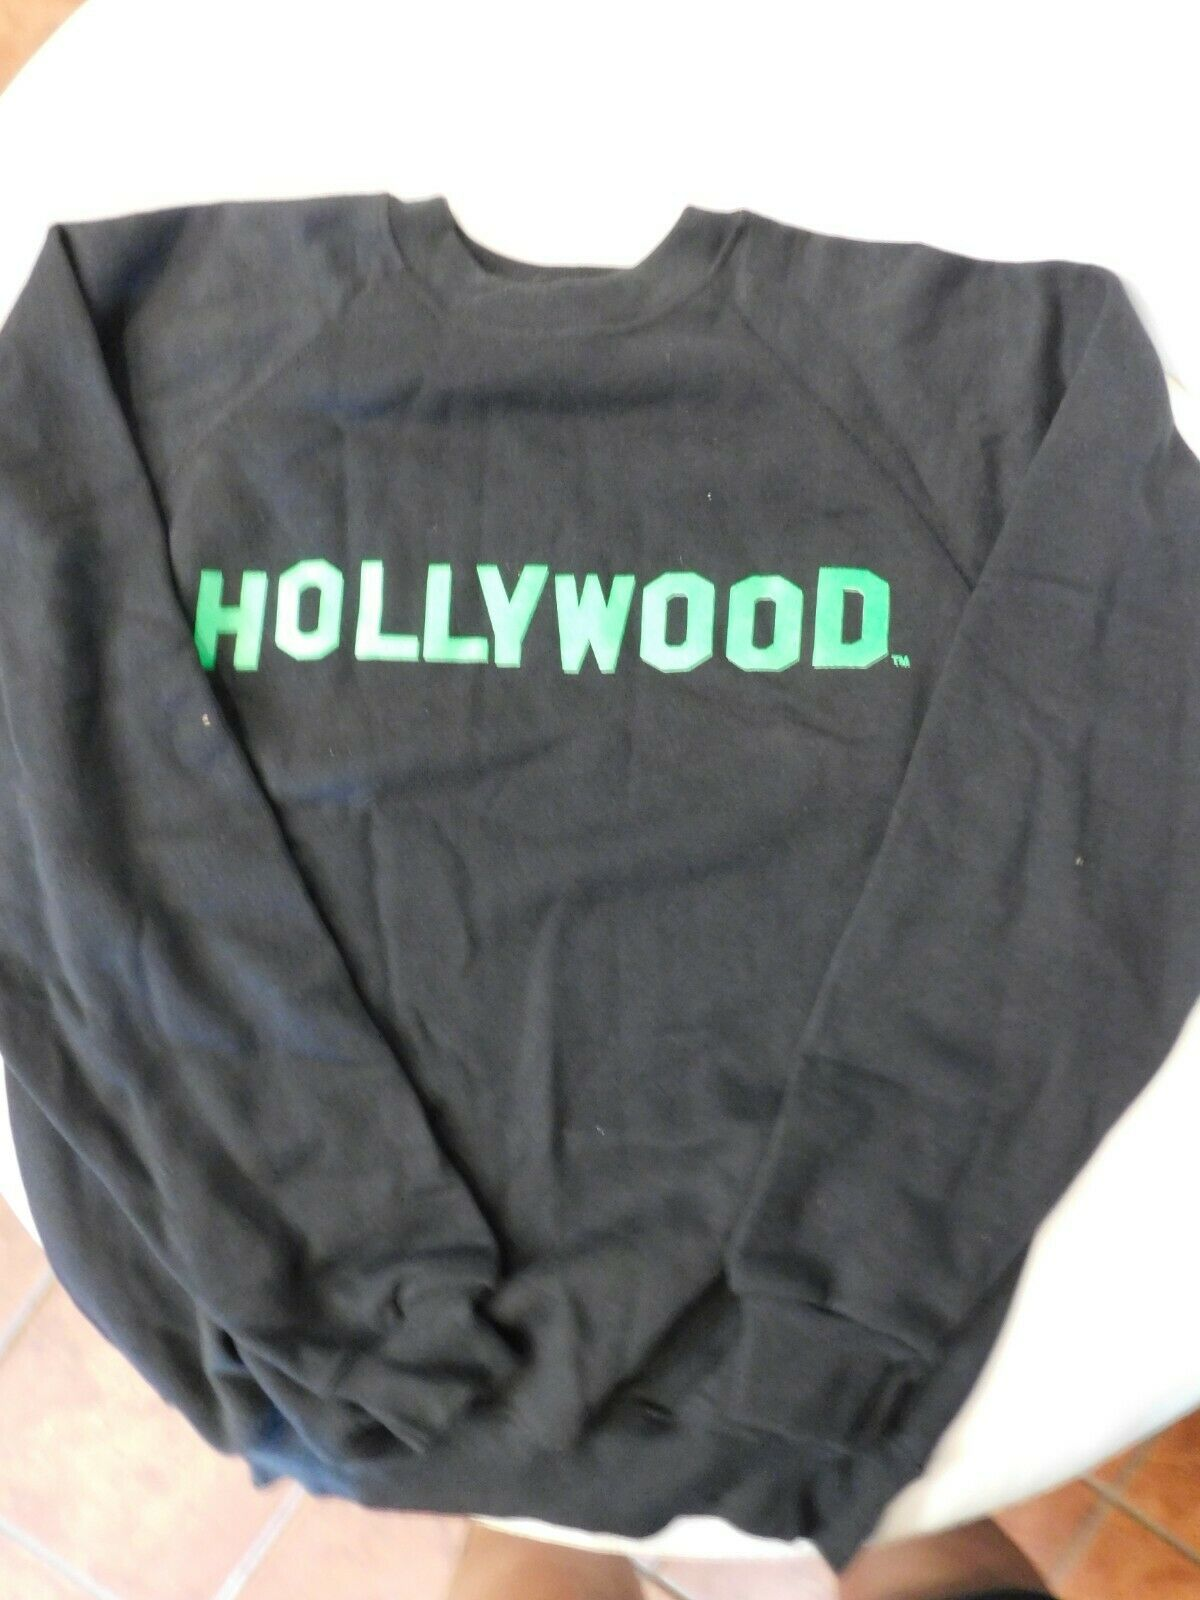 Hollywood Sweatshirt (green writing) xLarge T7